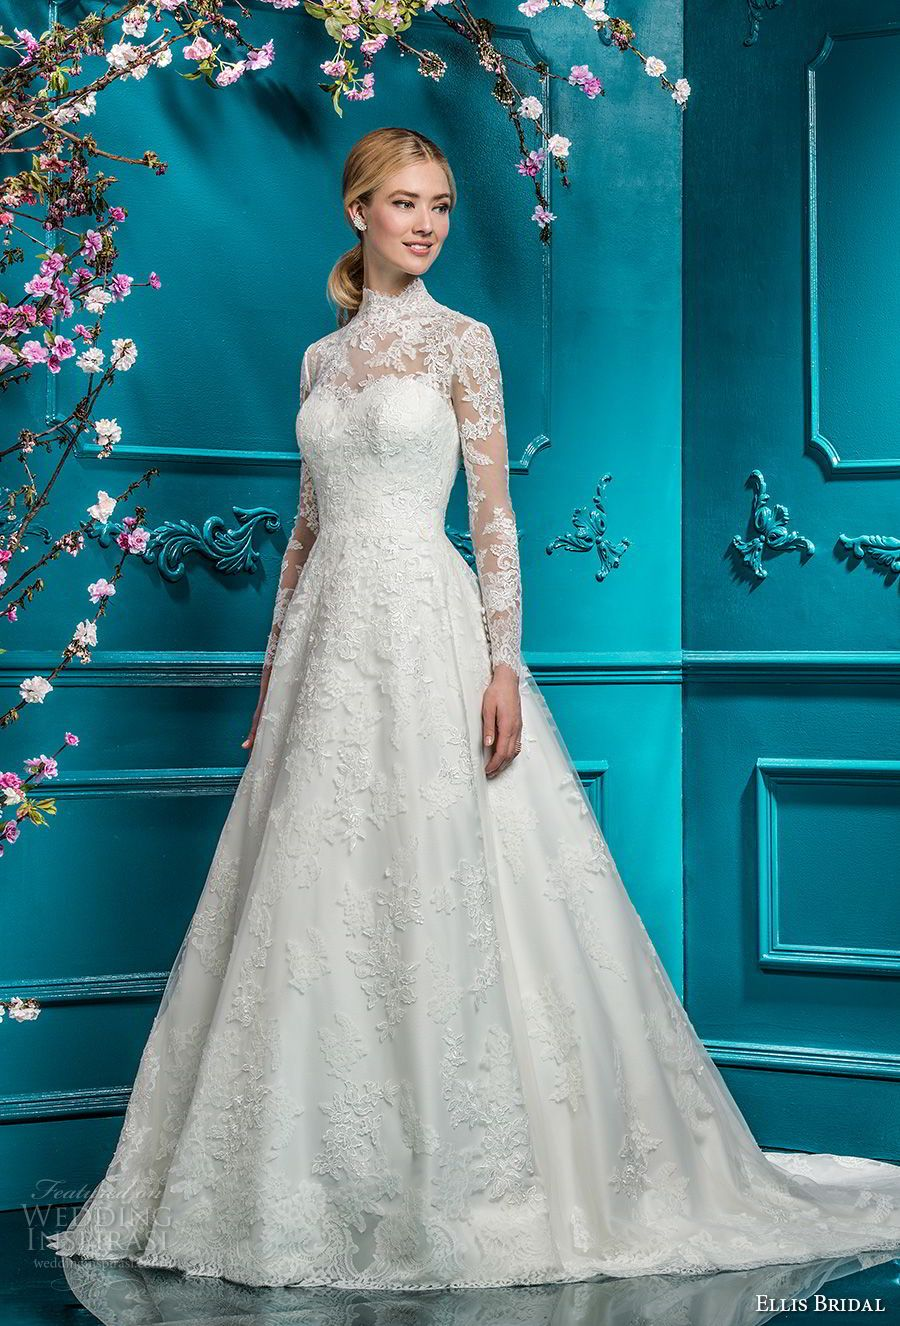 Ellis bridals wedding dresses u ucduskud bridal collection the